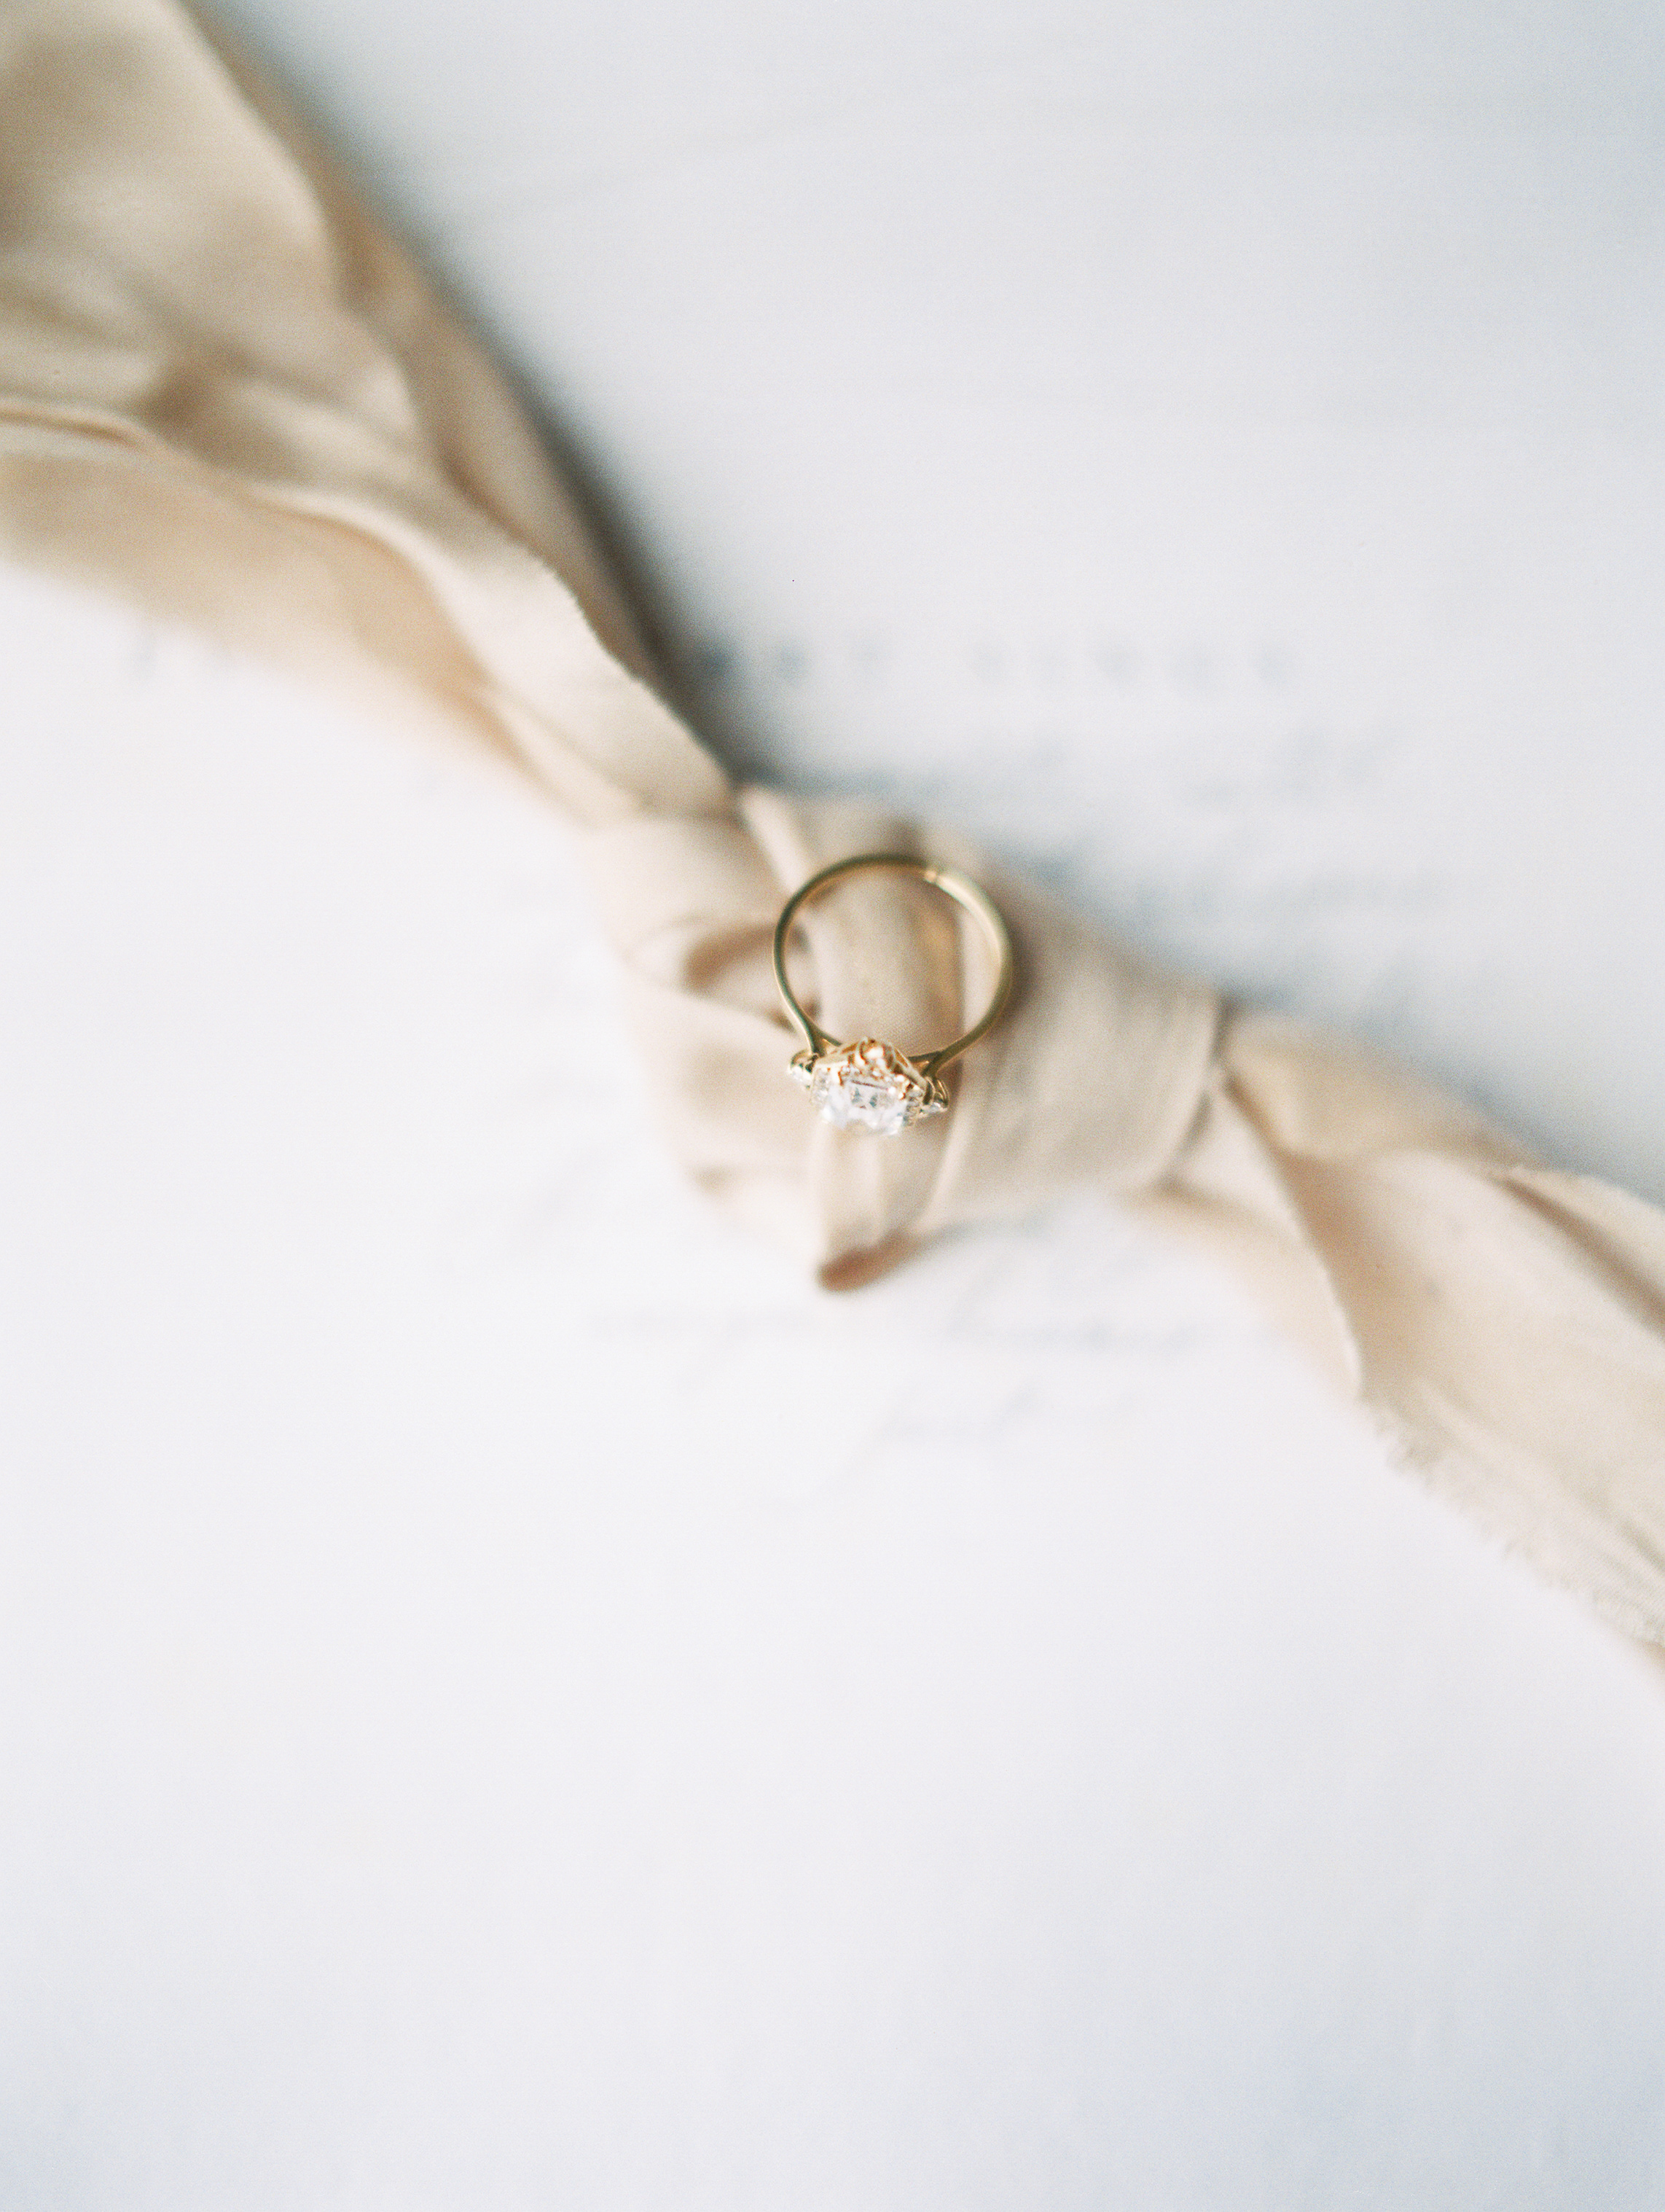 Photography: Jeremy Chou | Styling/Design: Natalie Papova | Calligraphy & Paper Goods: Spurlé Gul Studio | Ring: Susie Saltzman